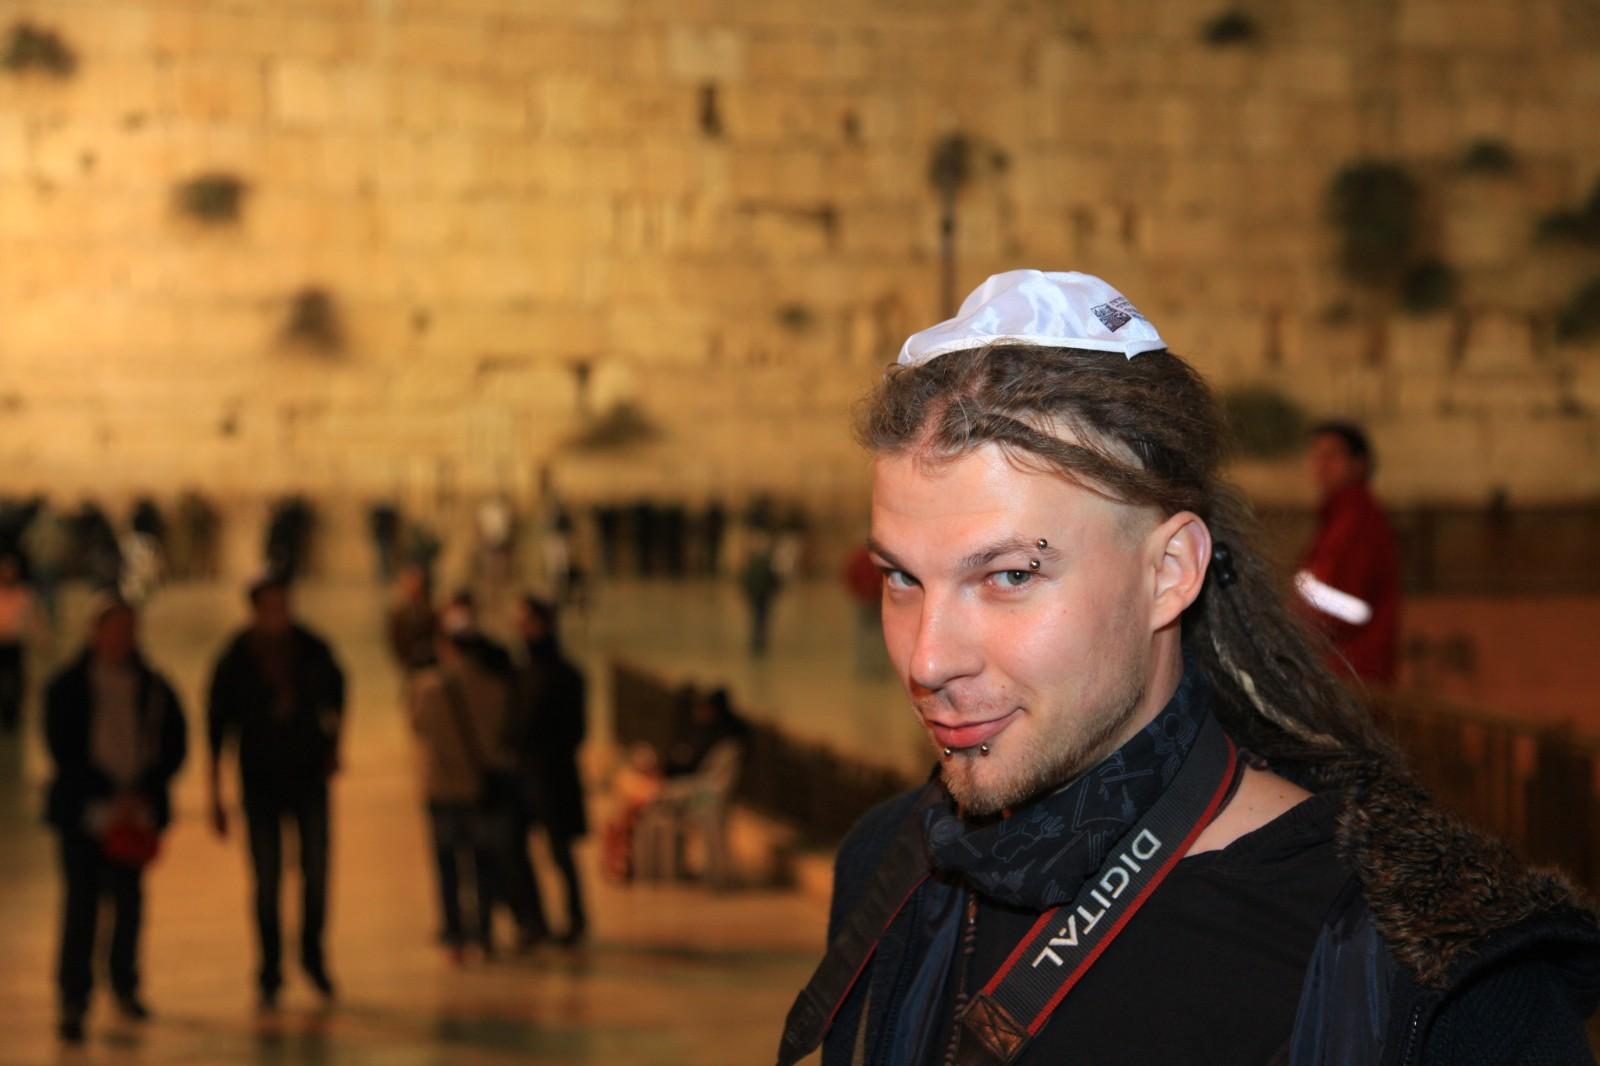 An unorthodox (and fake) Jew